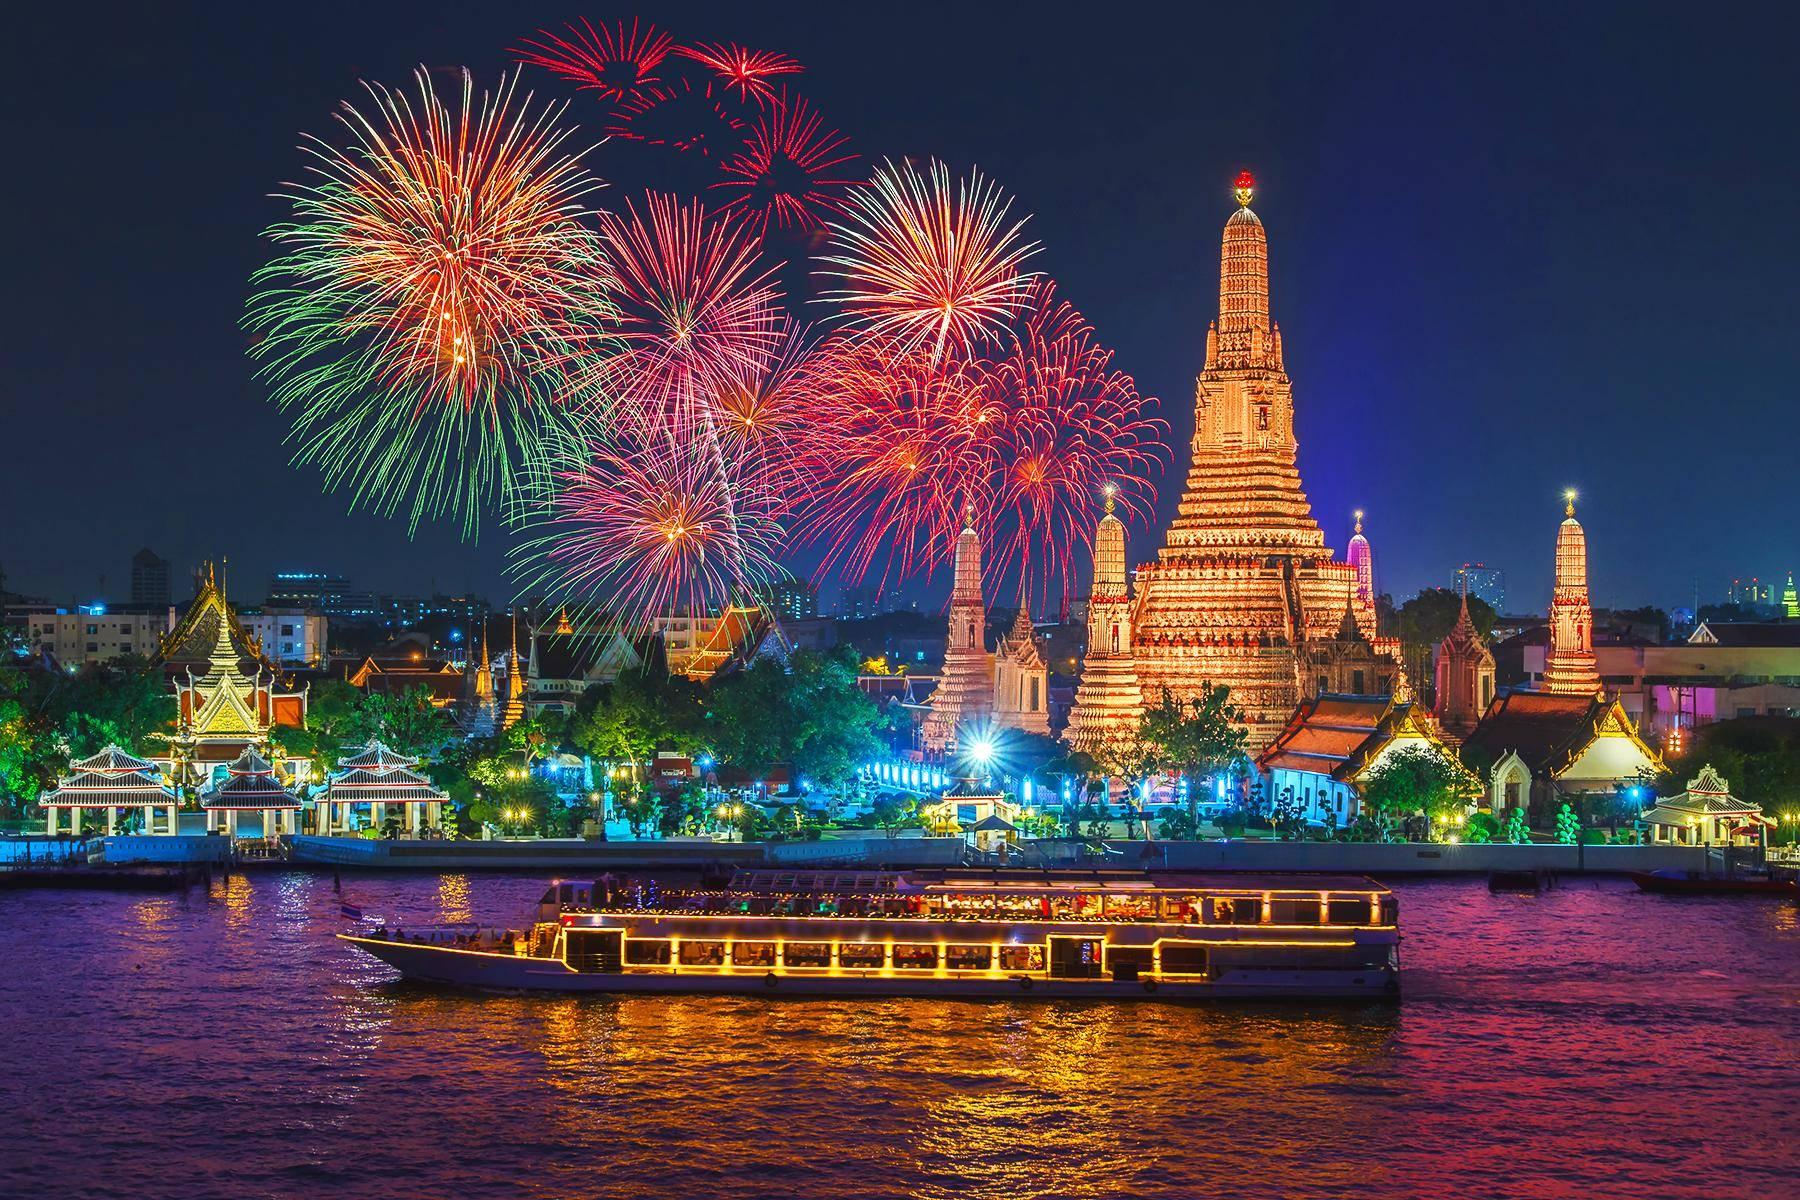 14 WheretoSpendNYE  Bangkok Shutterstock 523768189